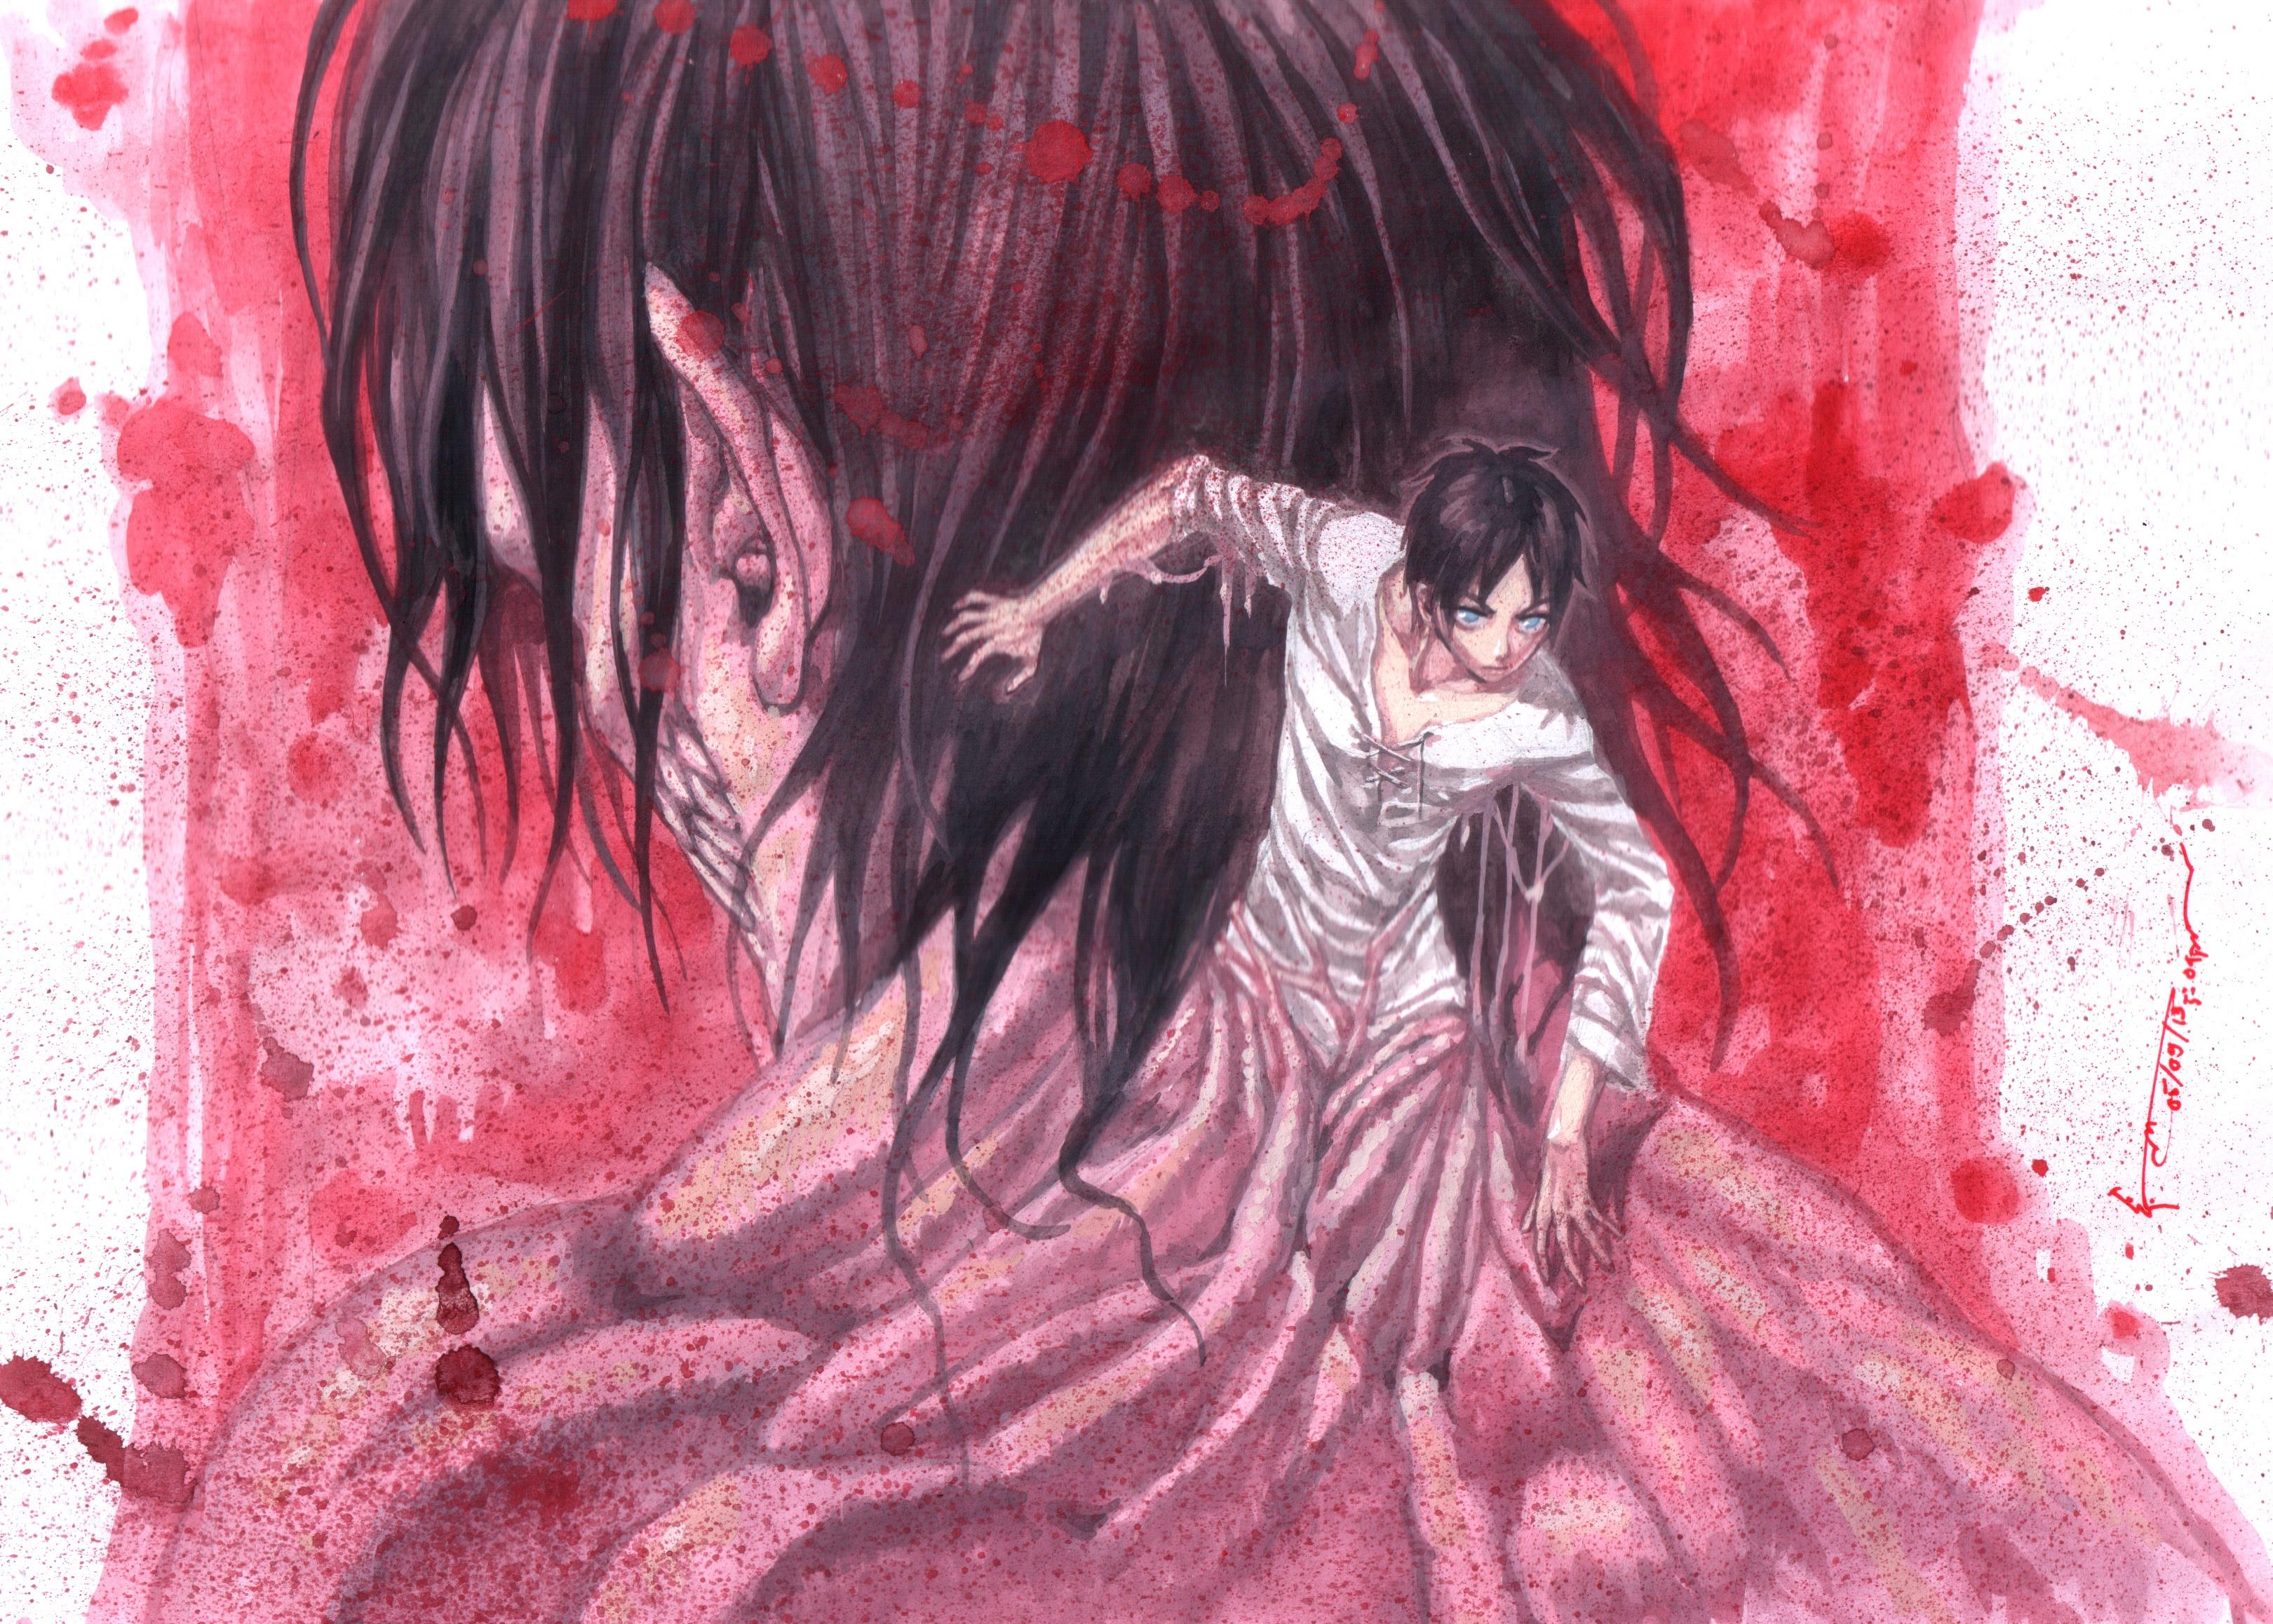 Anime Attack On Titan Wallpaper Resolution 3241x2316 Id 1055590 Wallha Com